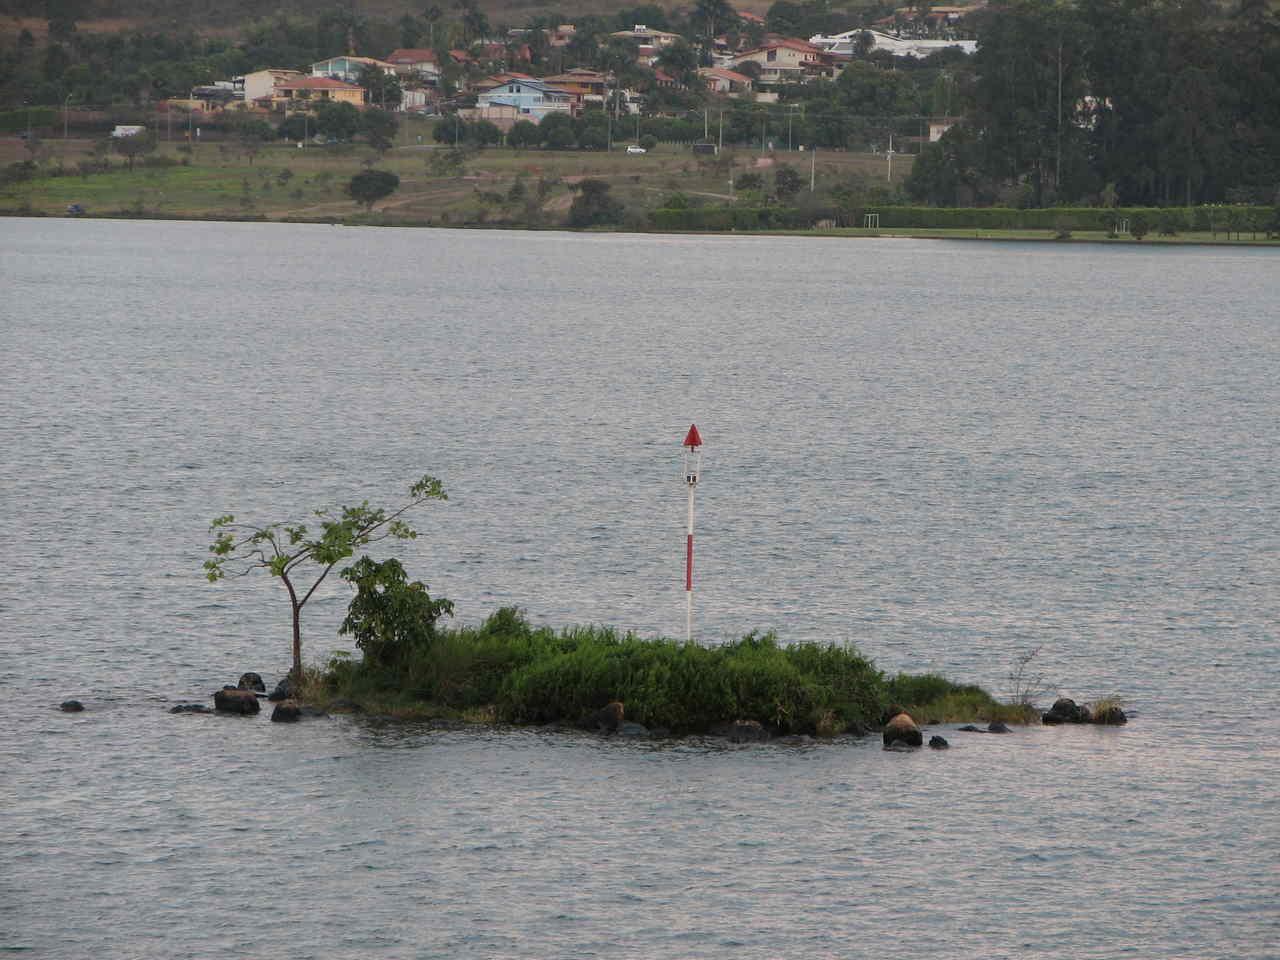 Ilha dos Clubes - Lago Paranoá